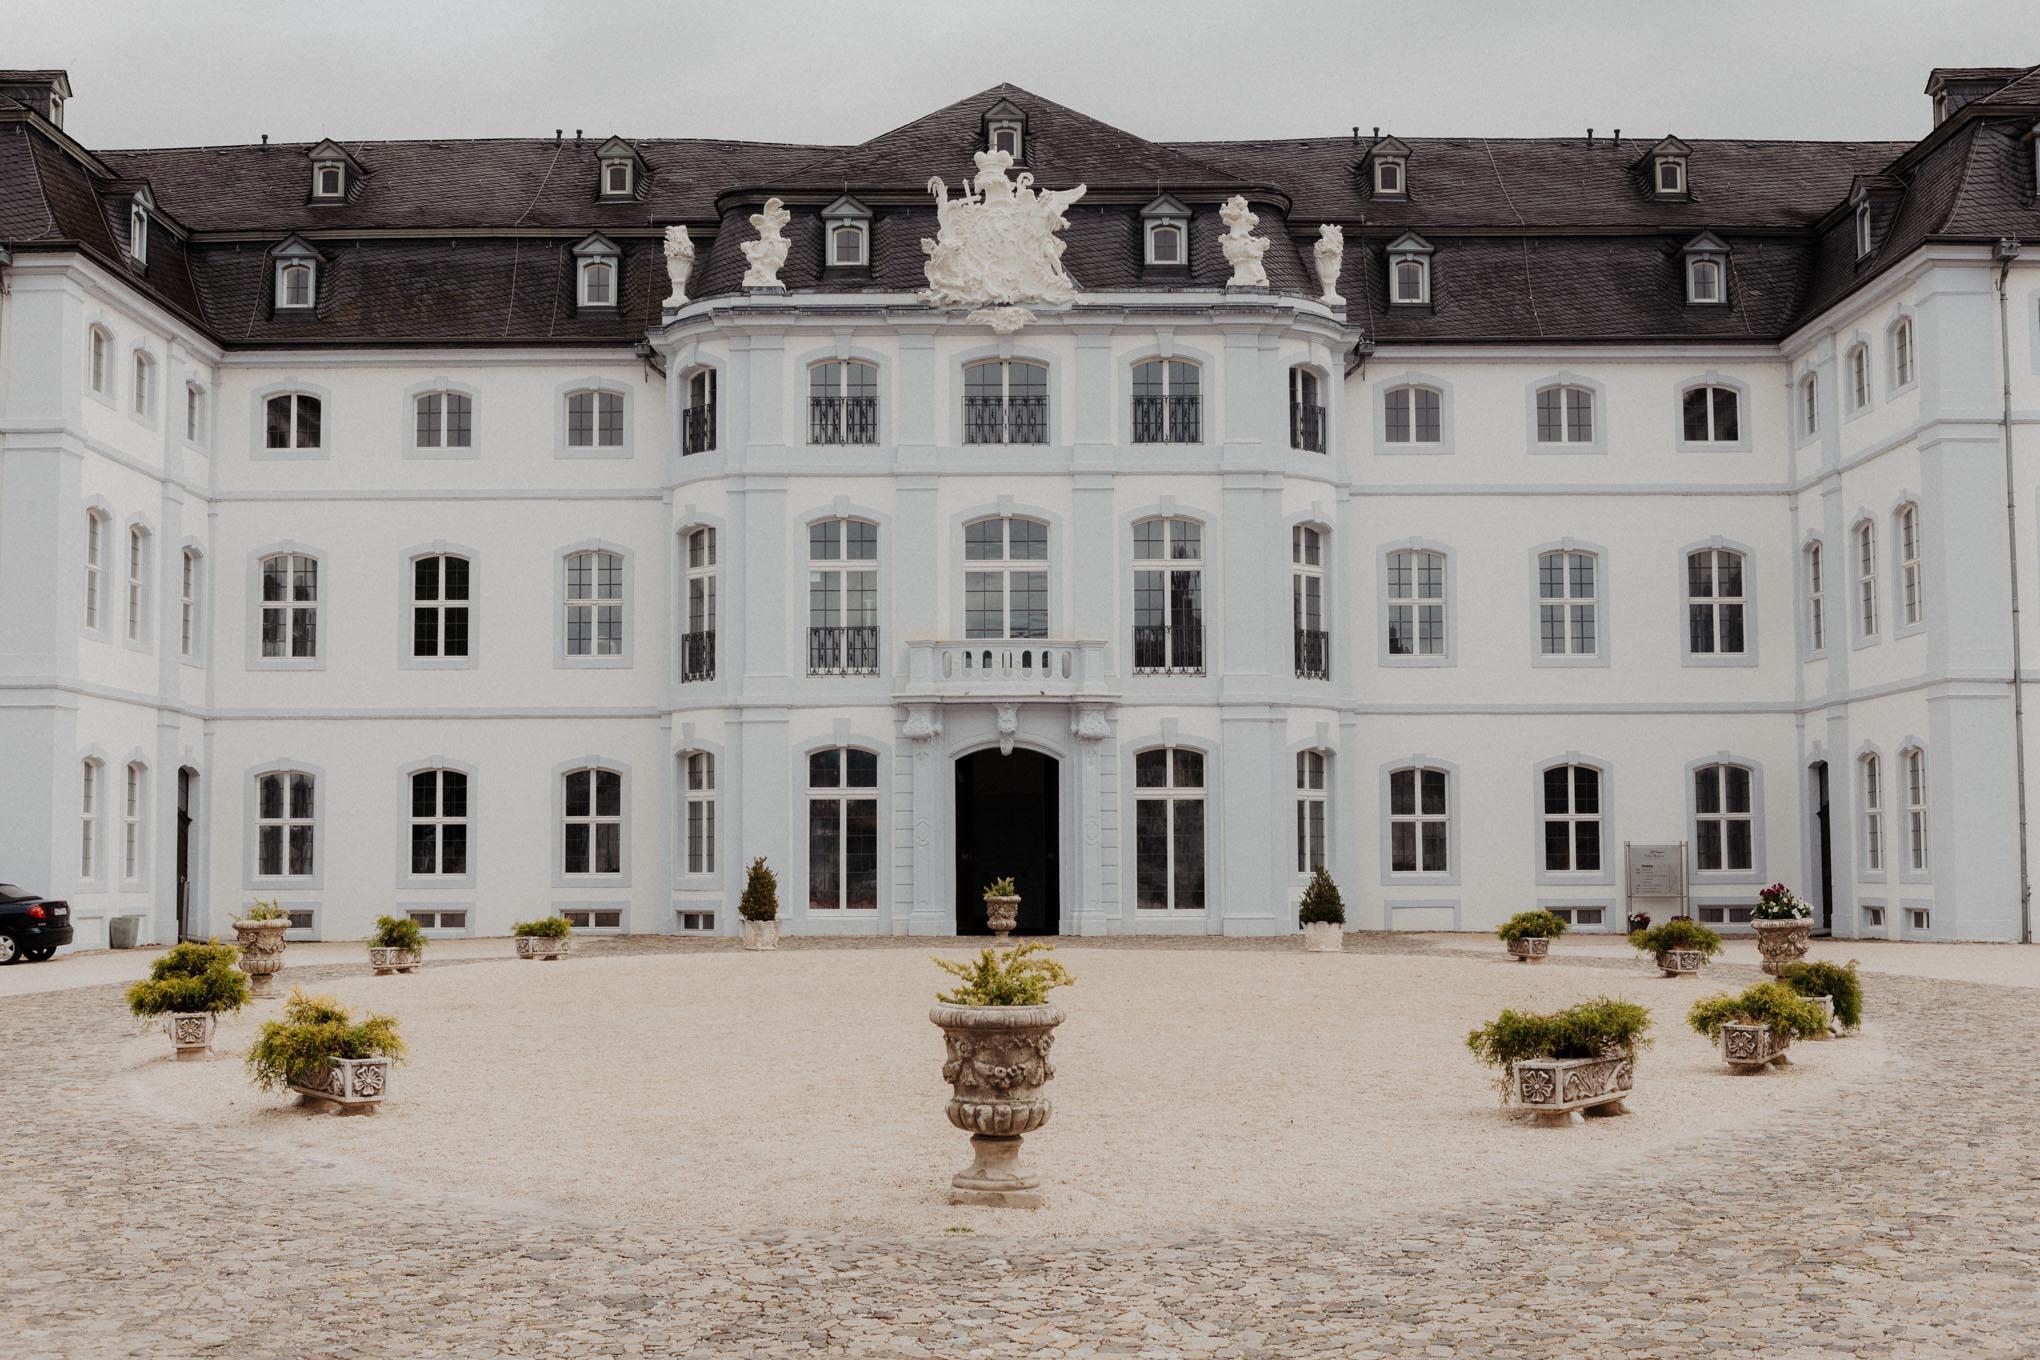 Eingangsbereich im Schloss Engers